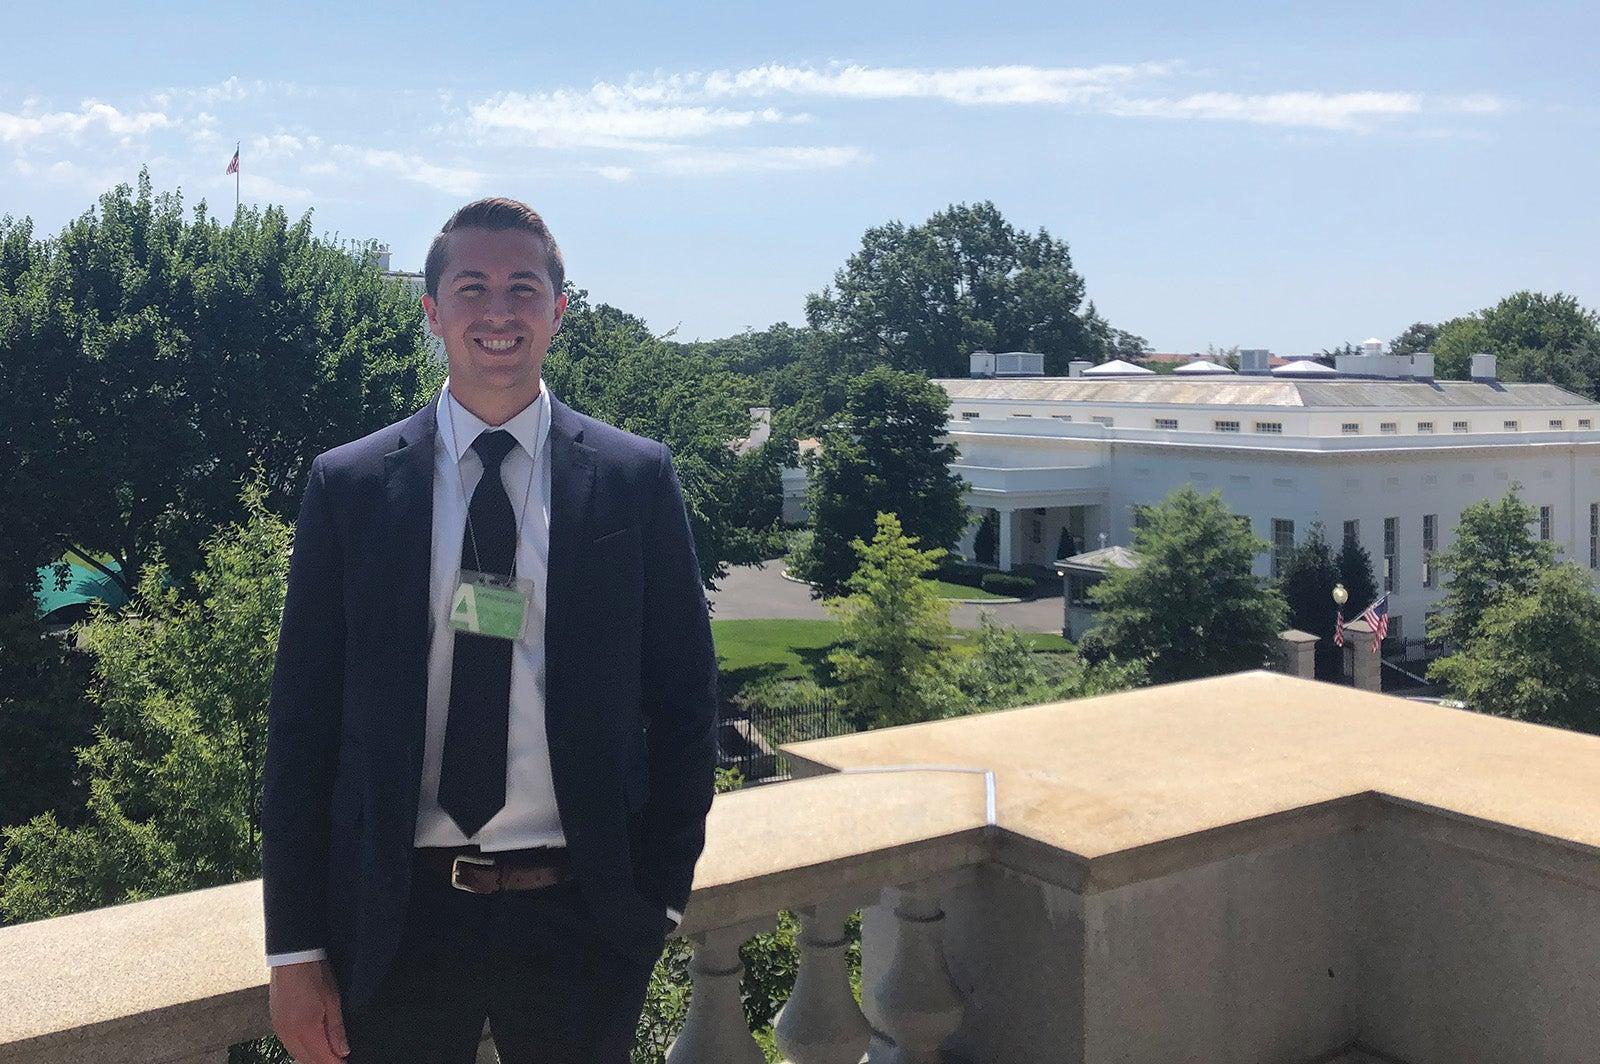 Wischer_Greg Wischer at the West Wing of the White House